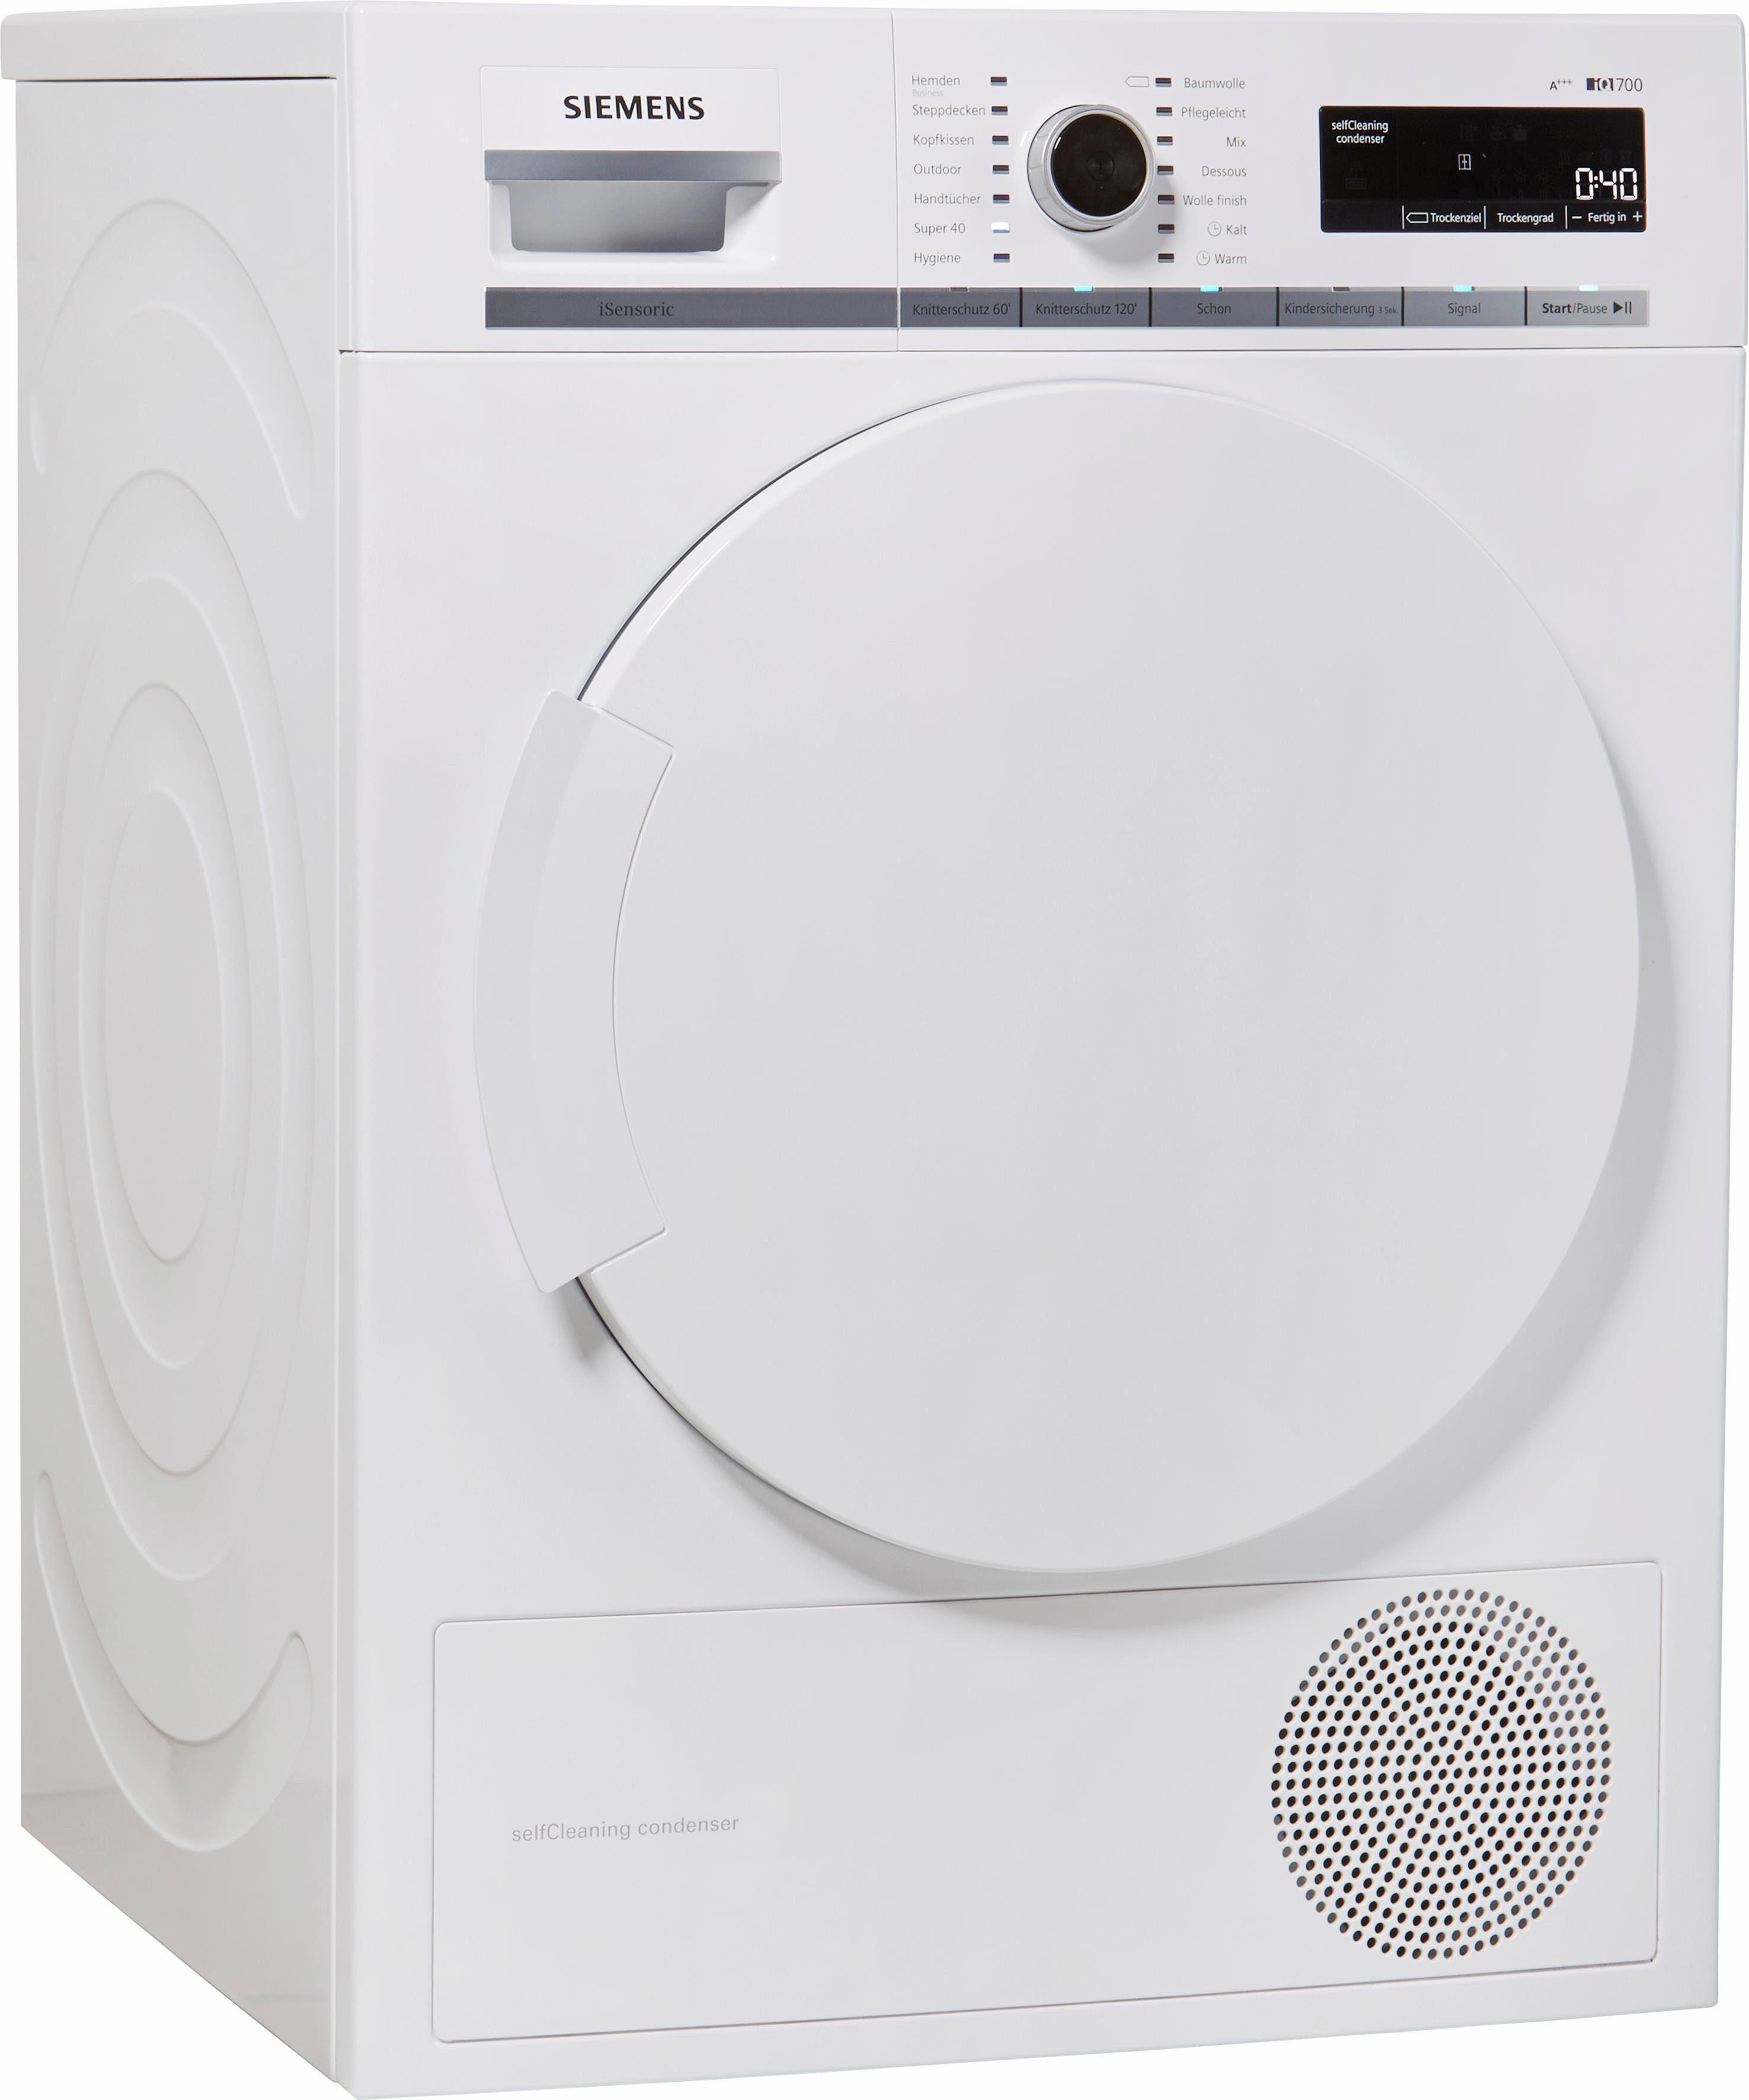 SIEMENS Wärmepumpentrockner iQ700 WT44W5W0, 8 kg